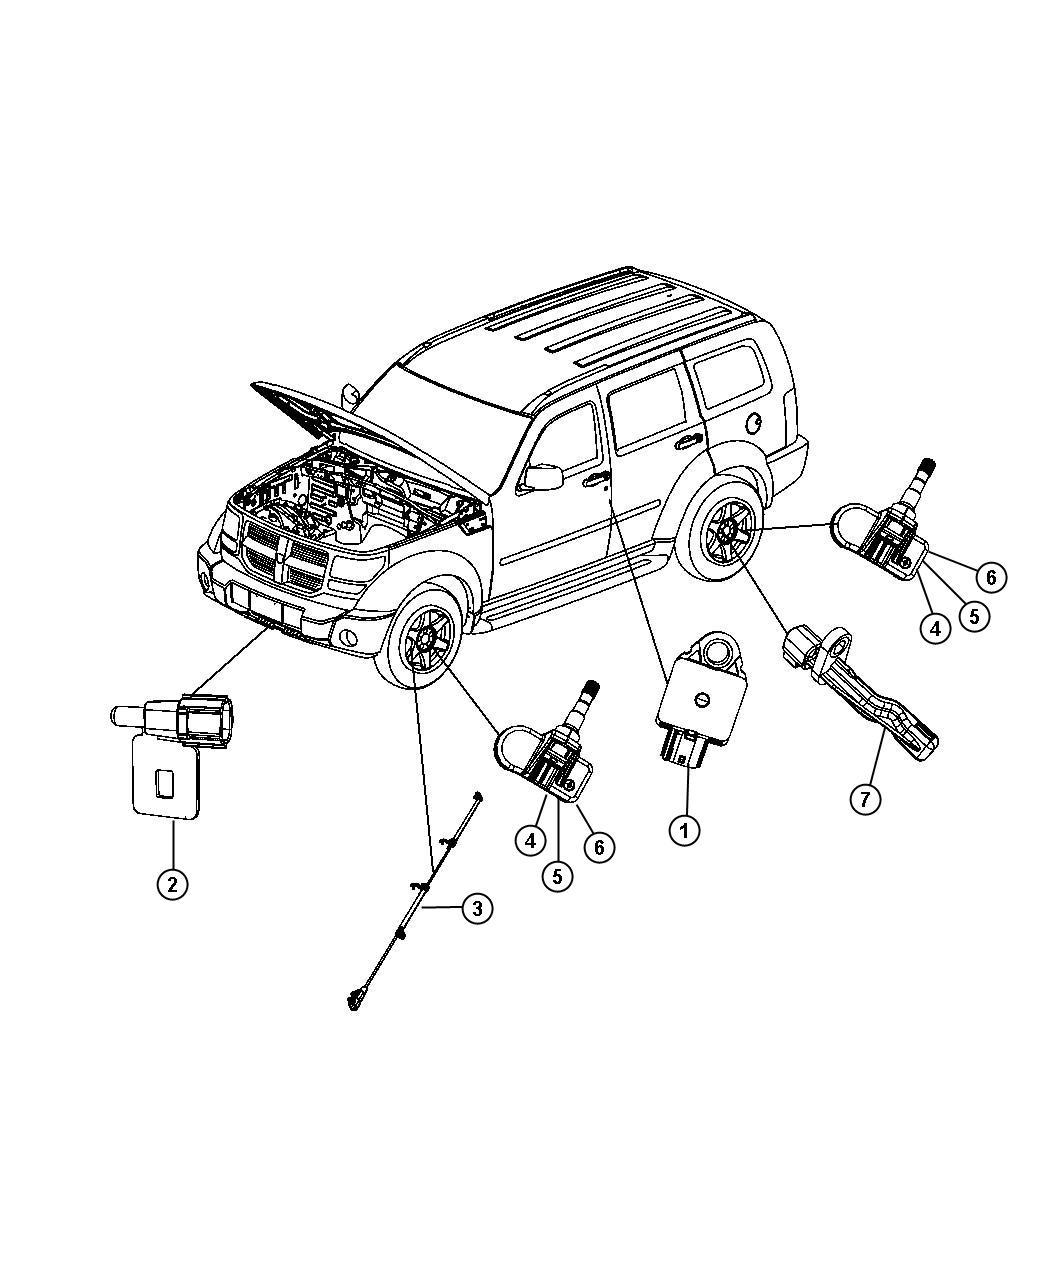 Dodge Nitro Sensor kit, sensor package. Anti-lock brakes